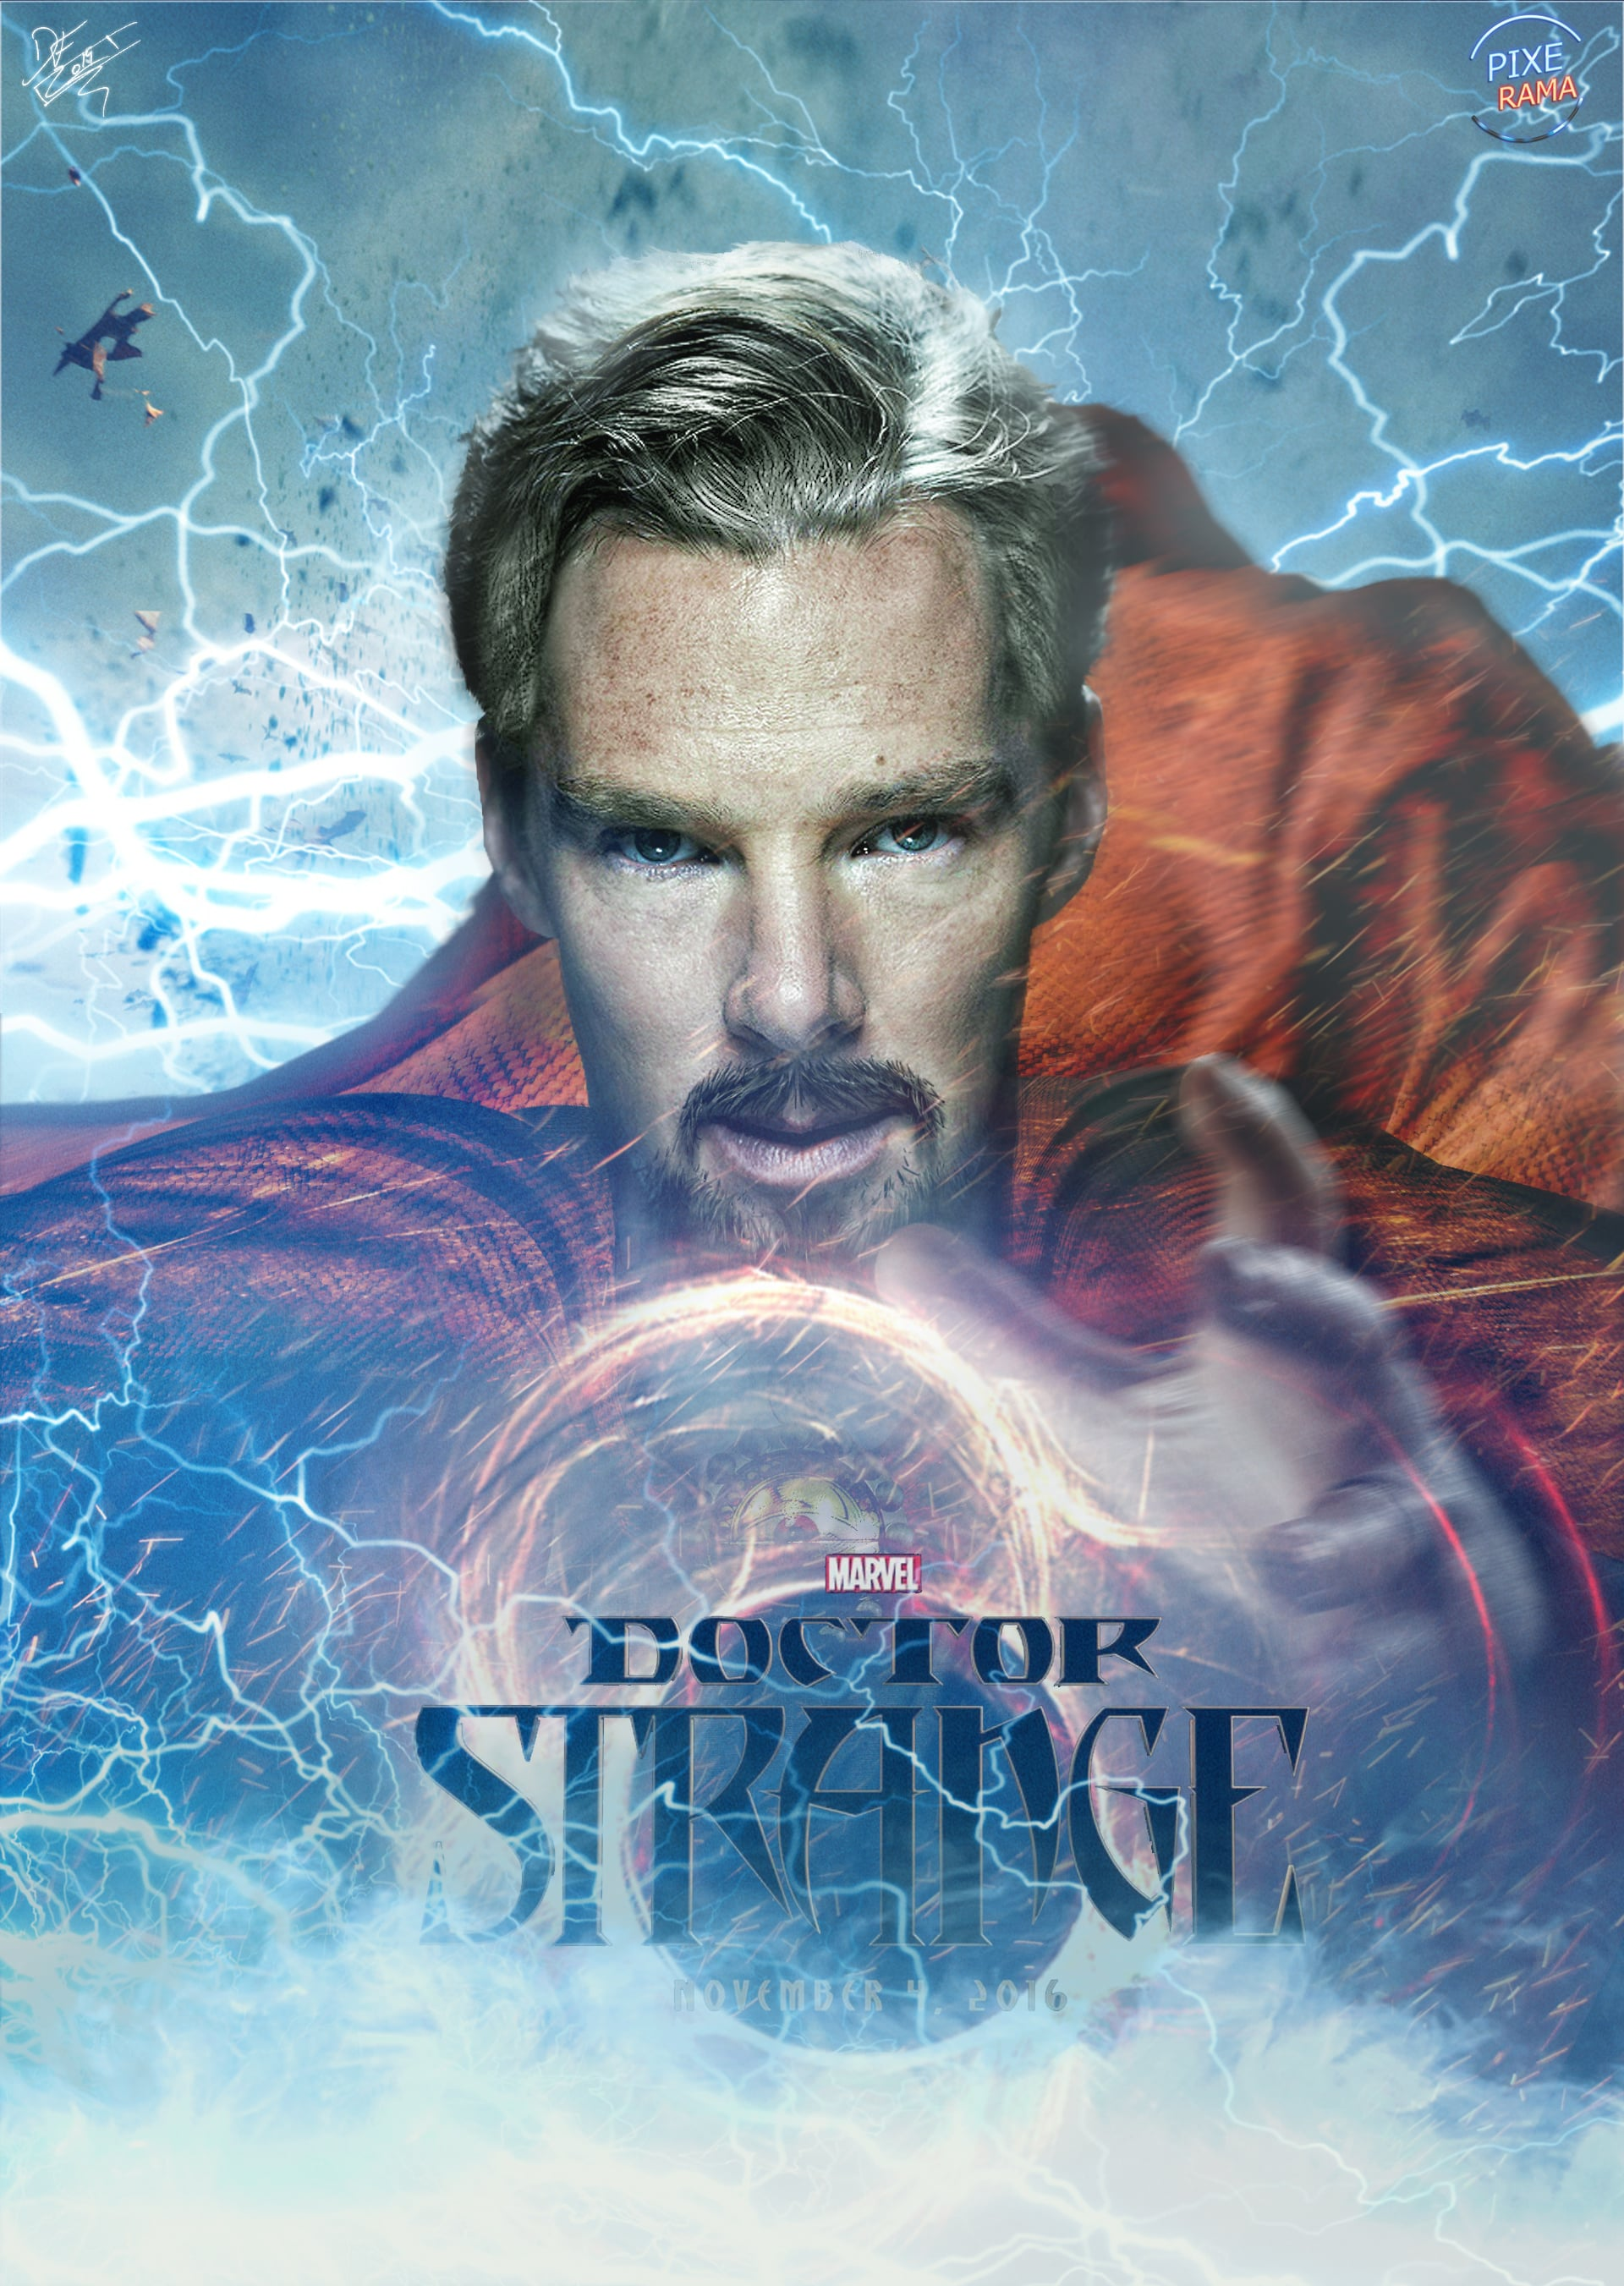 Doctor Strange For mobile